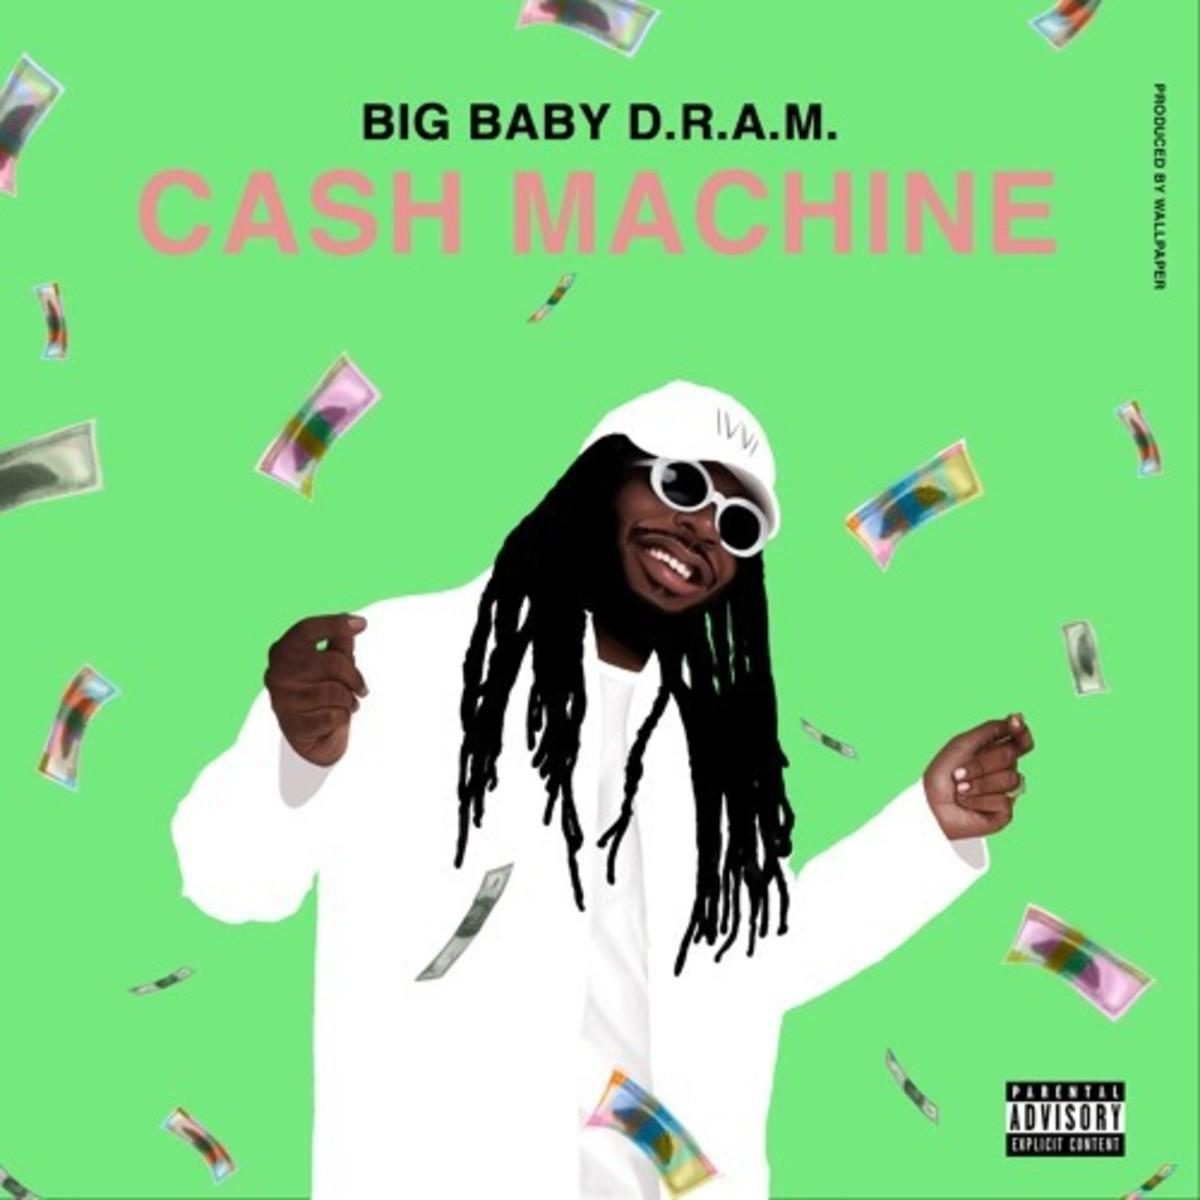 dram-cash-machine.jpg